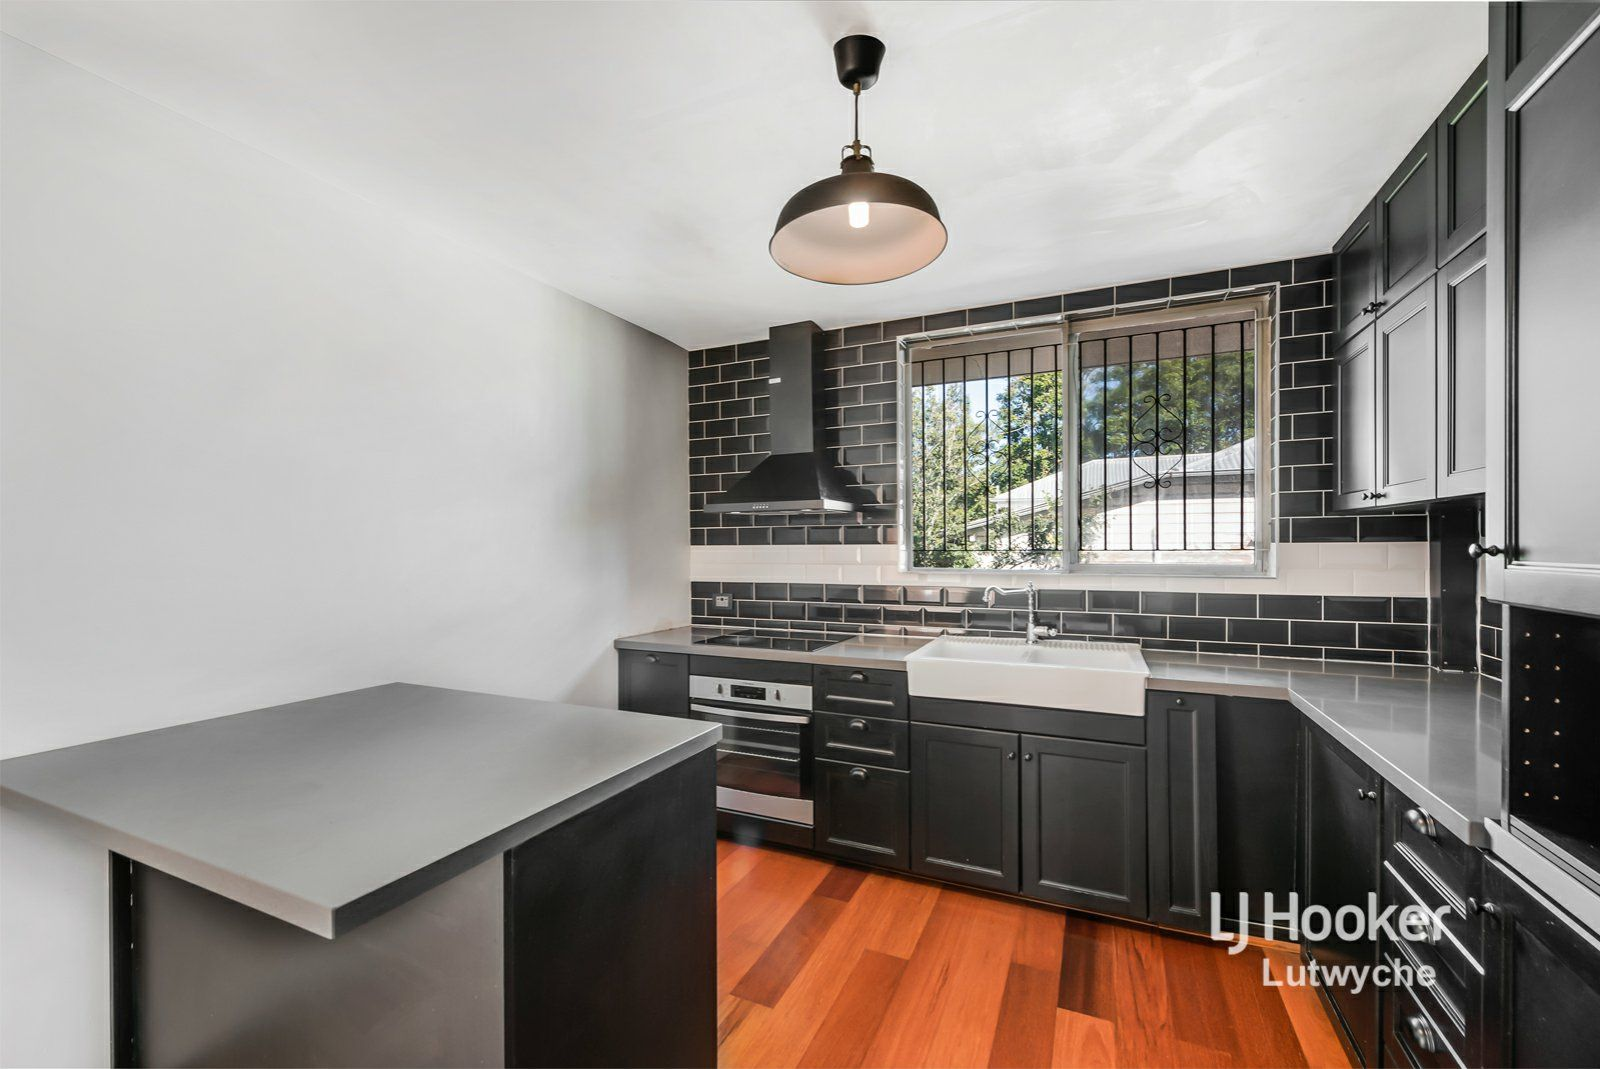 2/59 Lamington Avenue, Lutwyche QLD 4030, Image 0